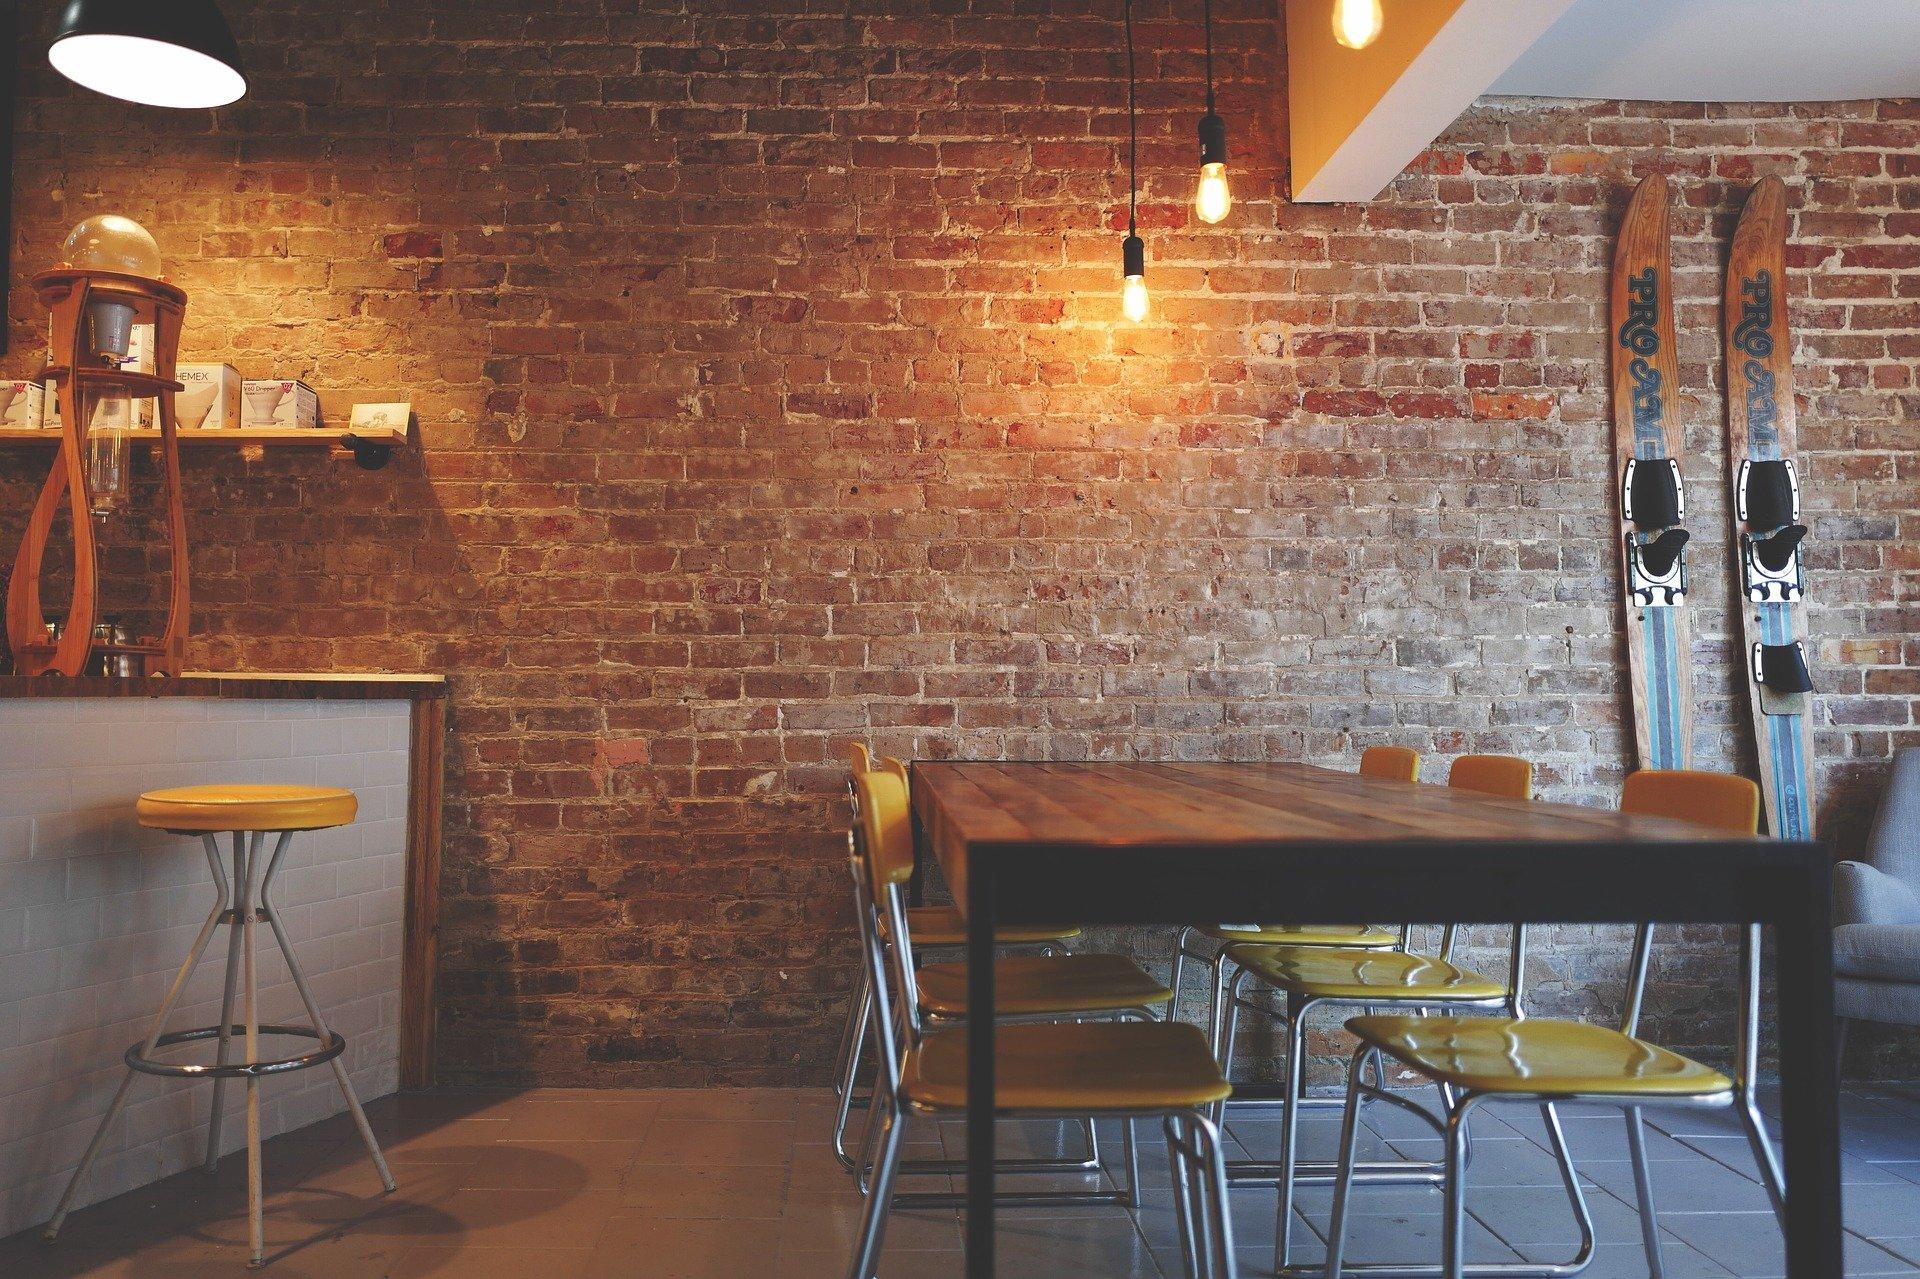 Com aconseguir que un bar, restaurant o cafeteria siguin accessibles